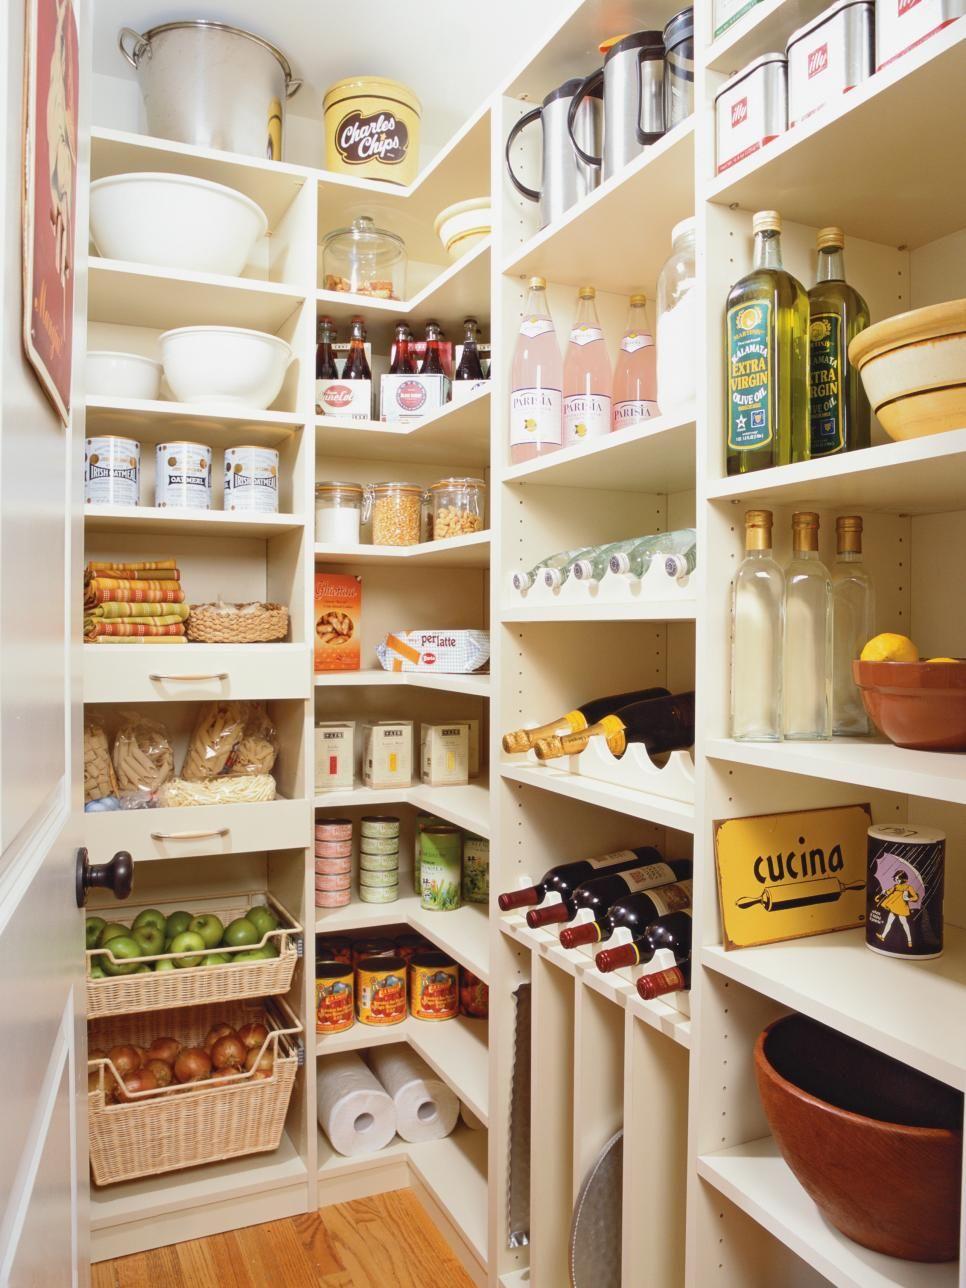 12 Kitchen Organization Tips From the Pros | Pinterest ...